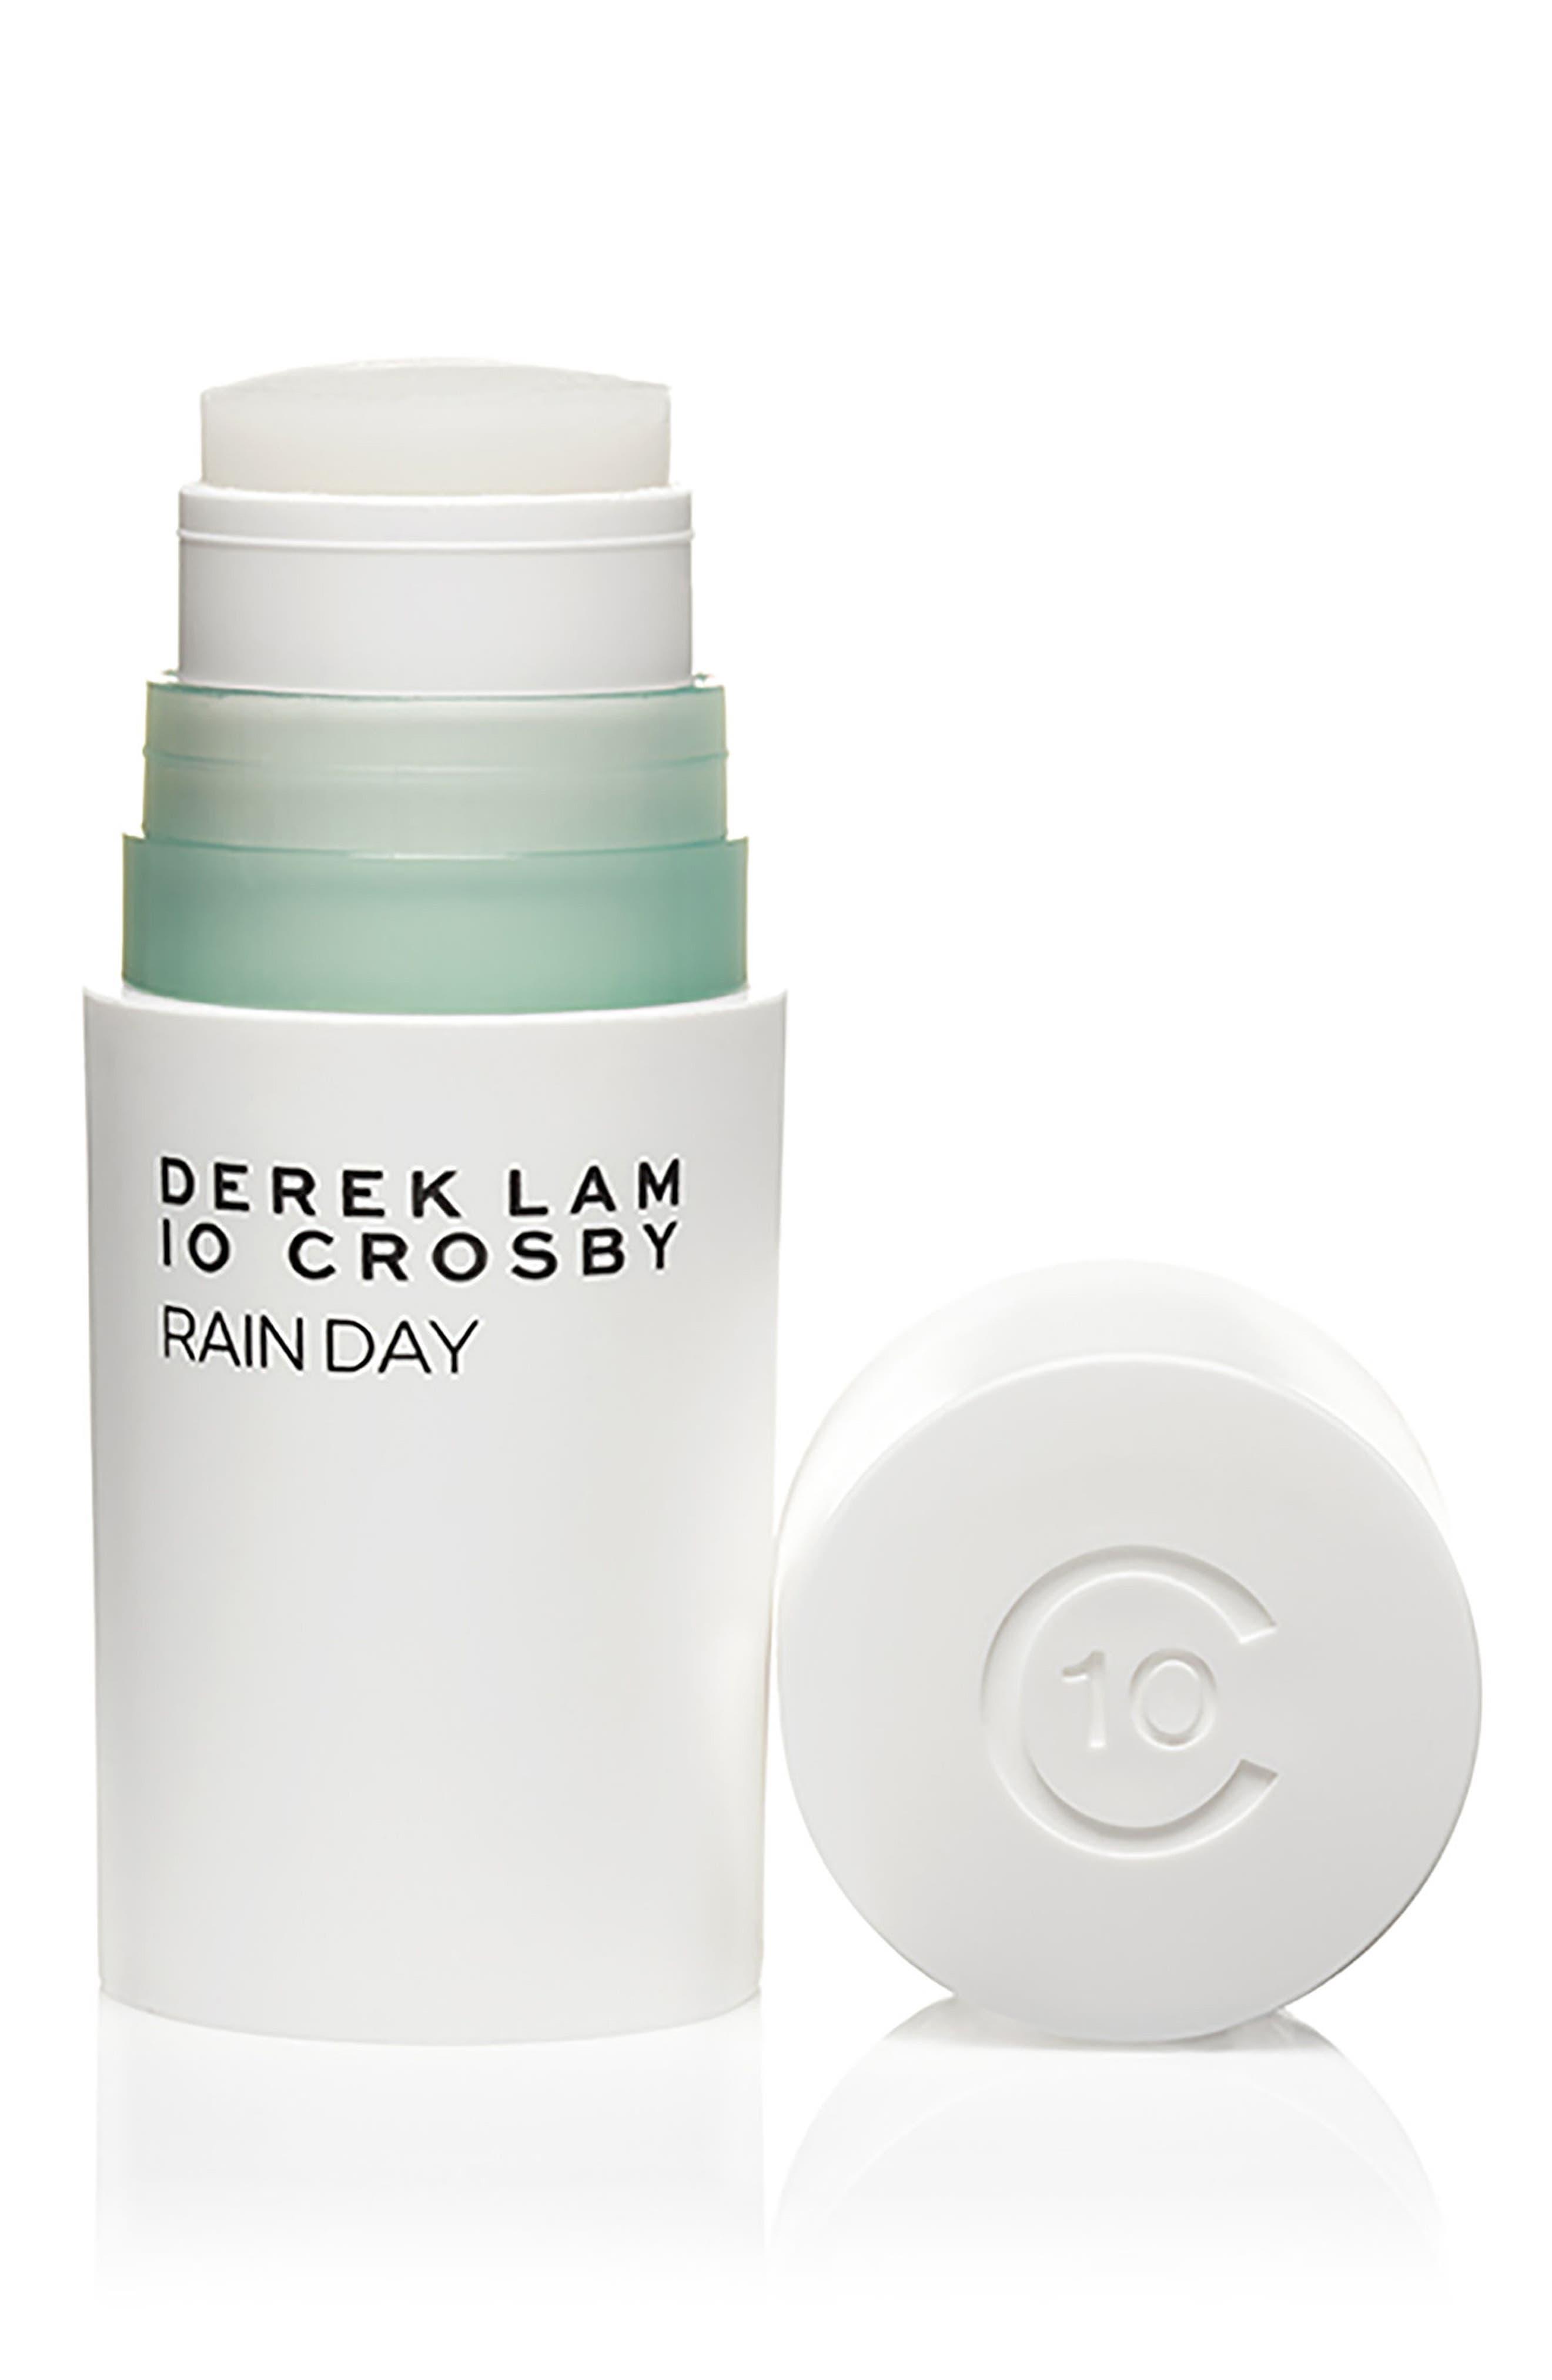 Alternate Image 1 Selected - Derek Lam 10 Crosby Rain Day Parfum Stick (Nordstrom Exclusive)